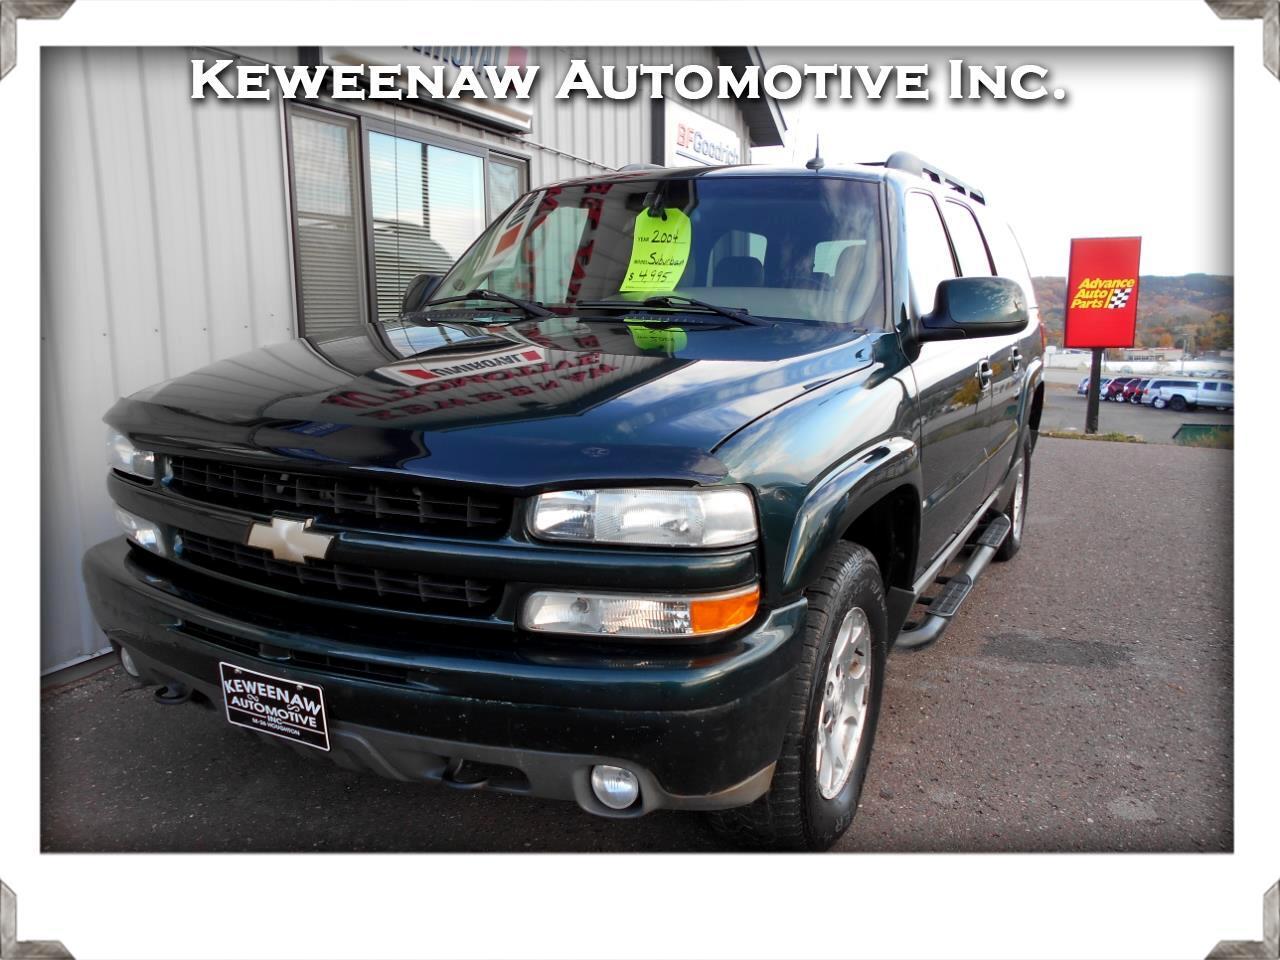 2004 Chevrolet Suburban 4dr 1500 4WD Z71